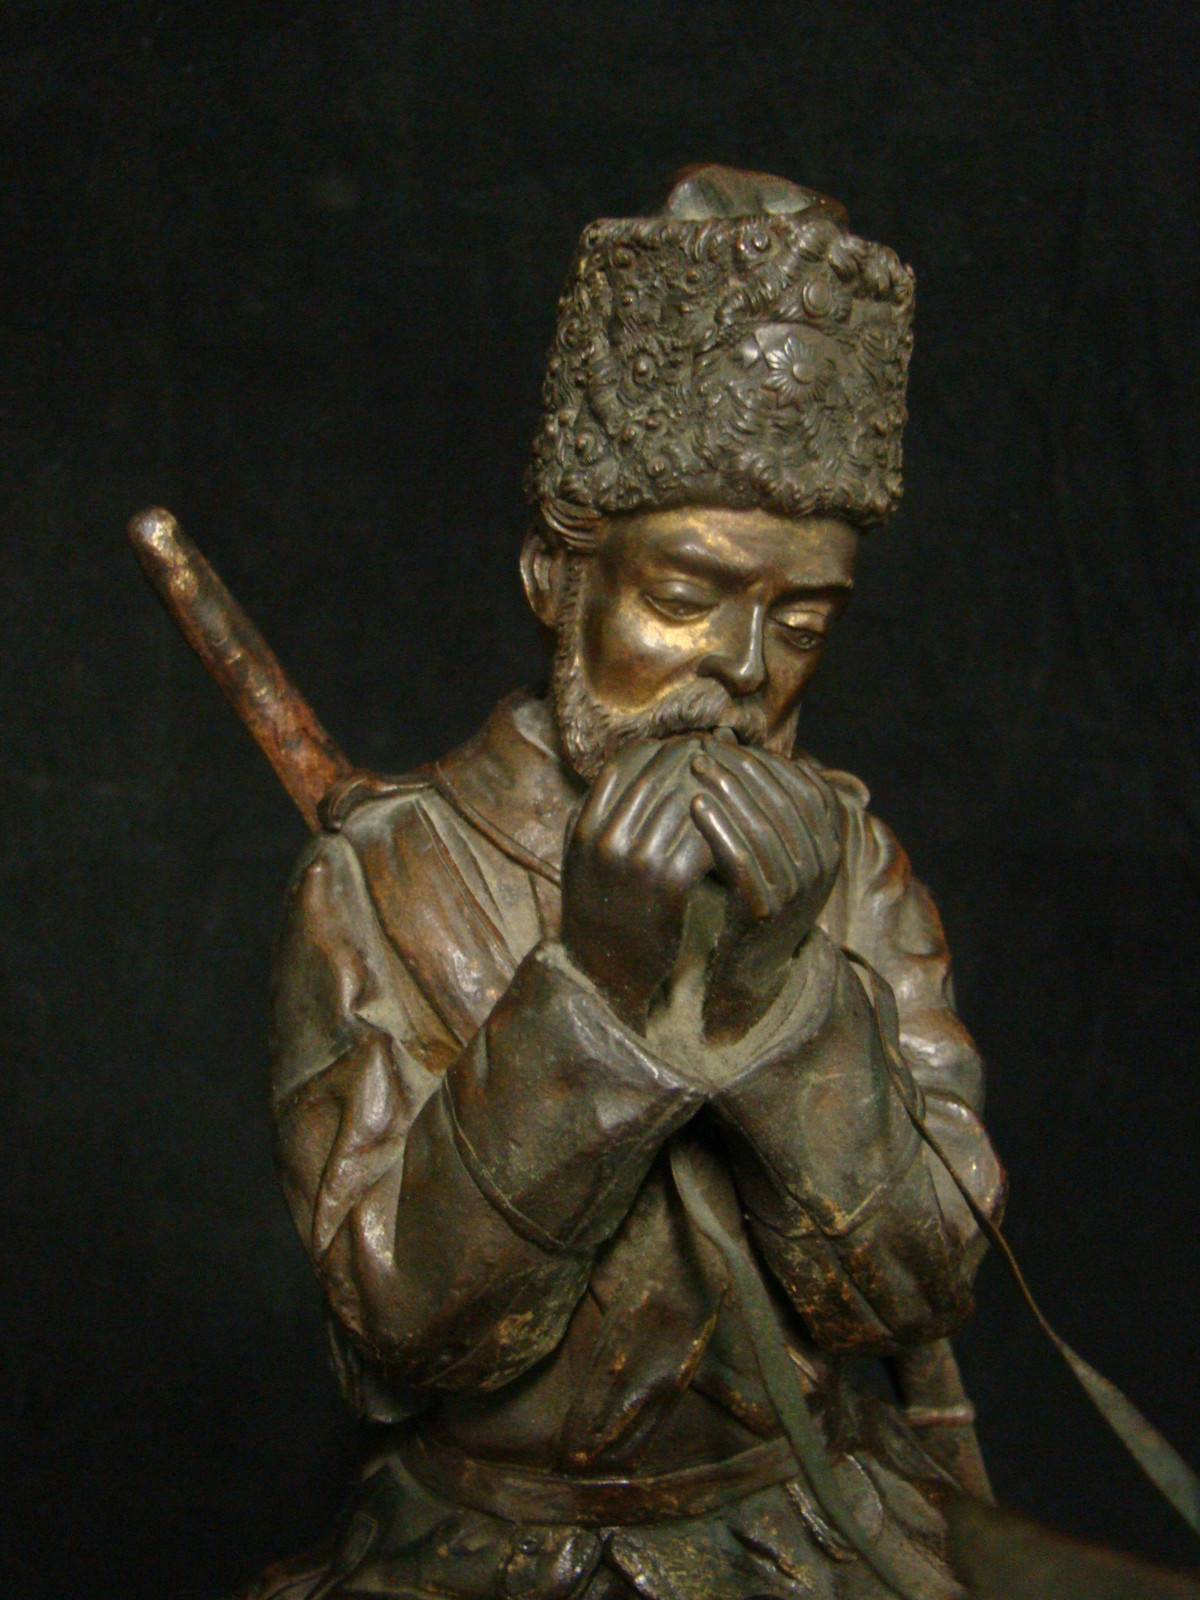 samonov-samonoff - samonoff-samonov_bronze